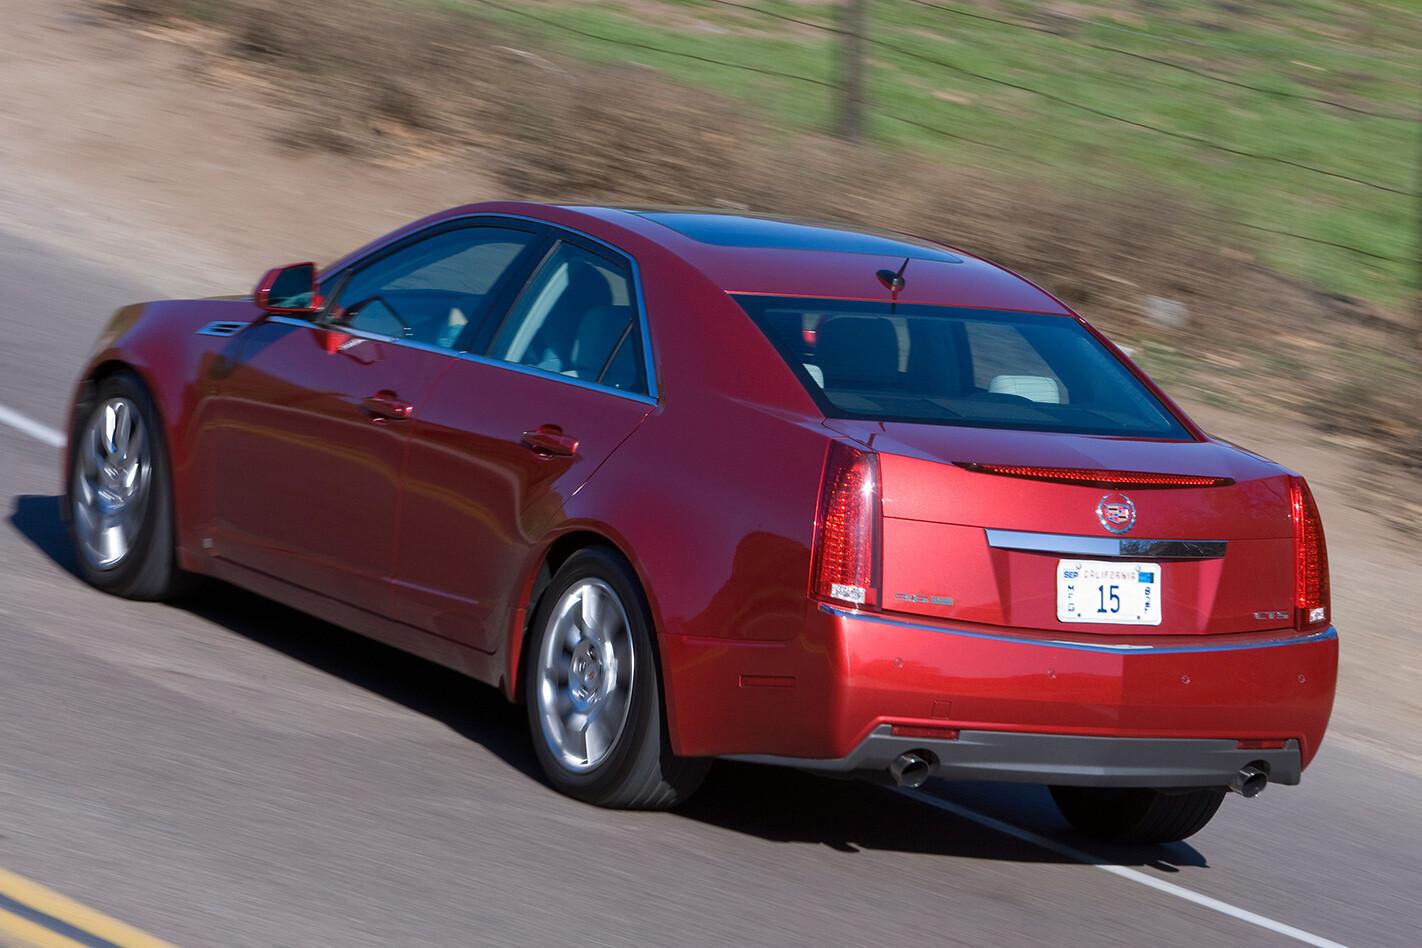 Cadillac-CTS-rear.jpg